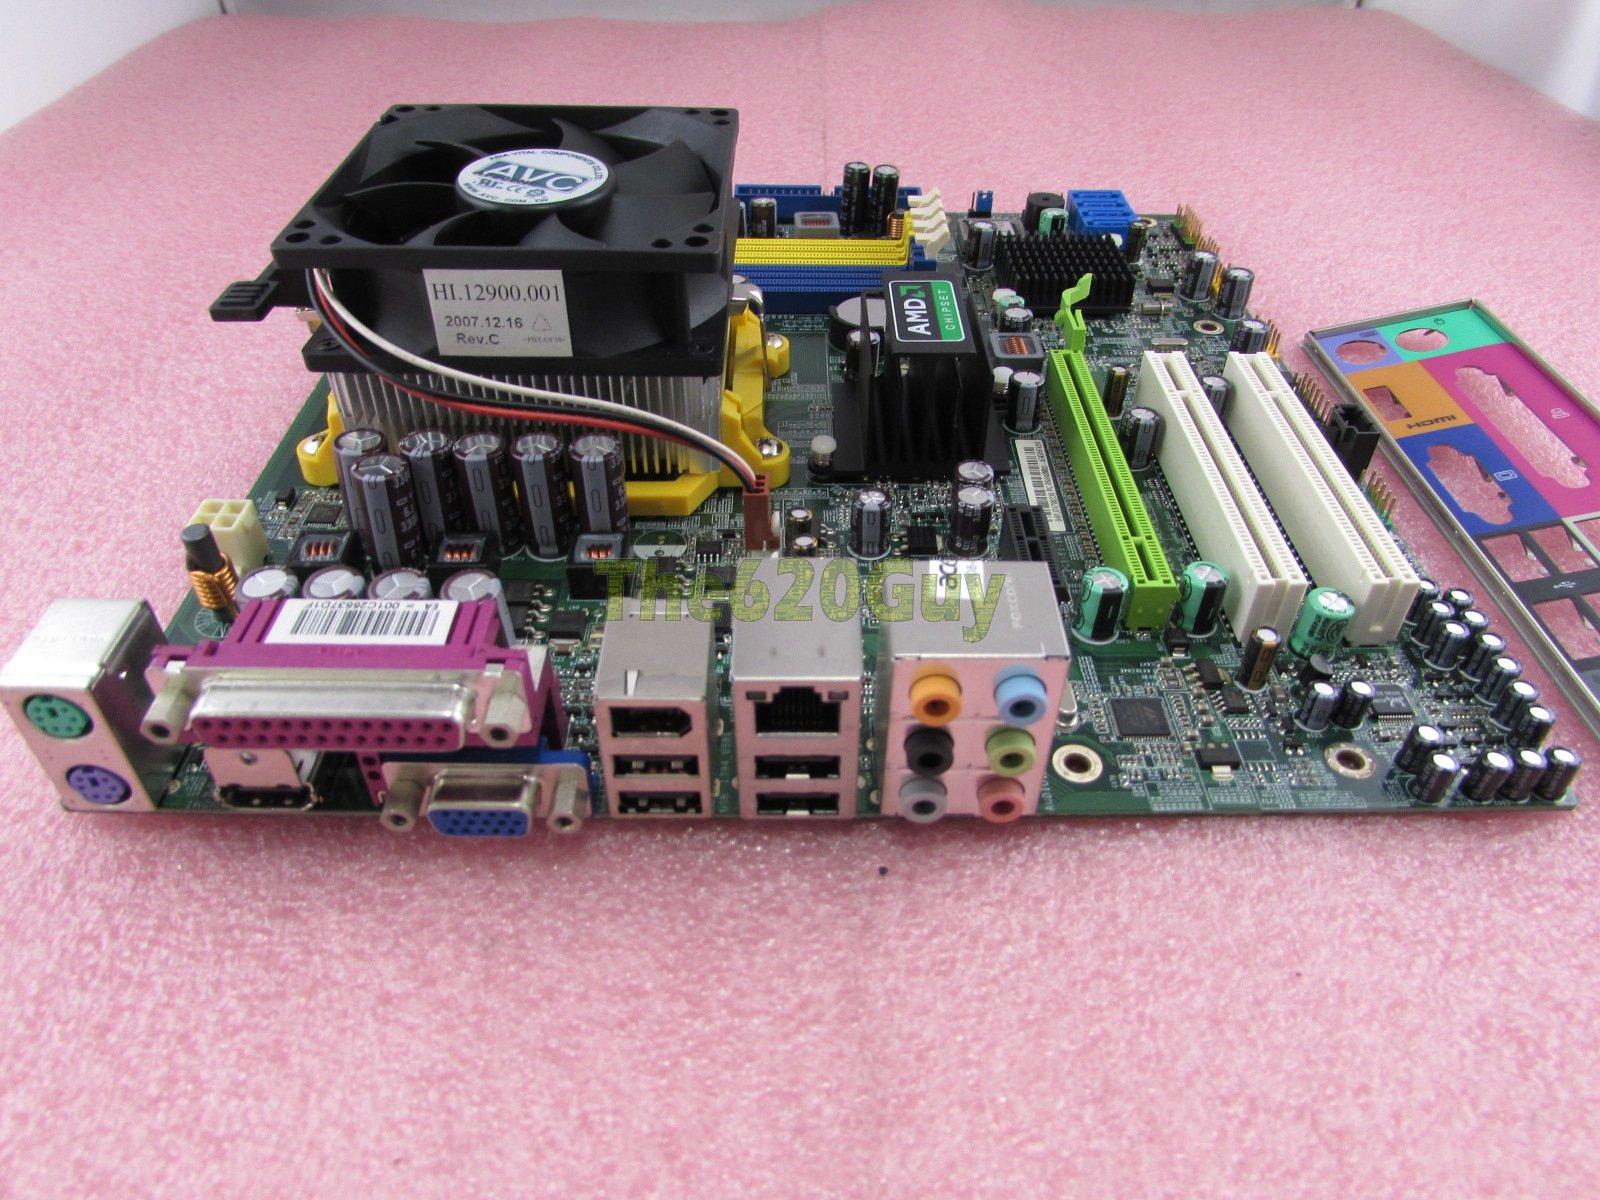 Rs690m03 Motherboard manual